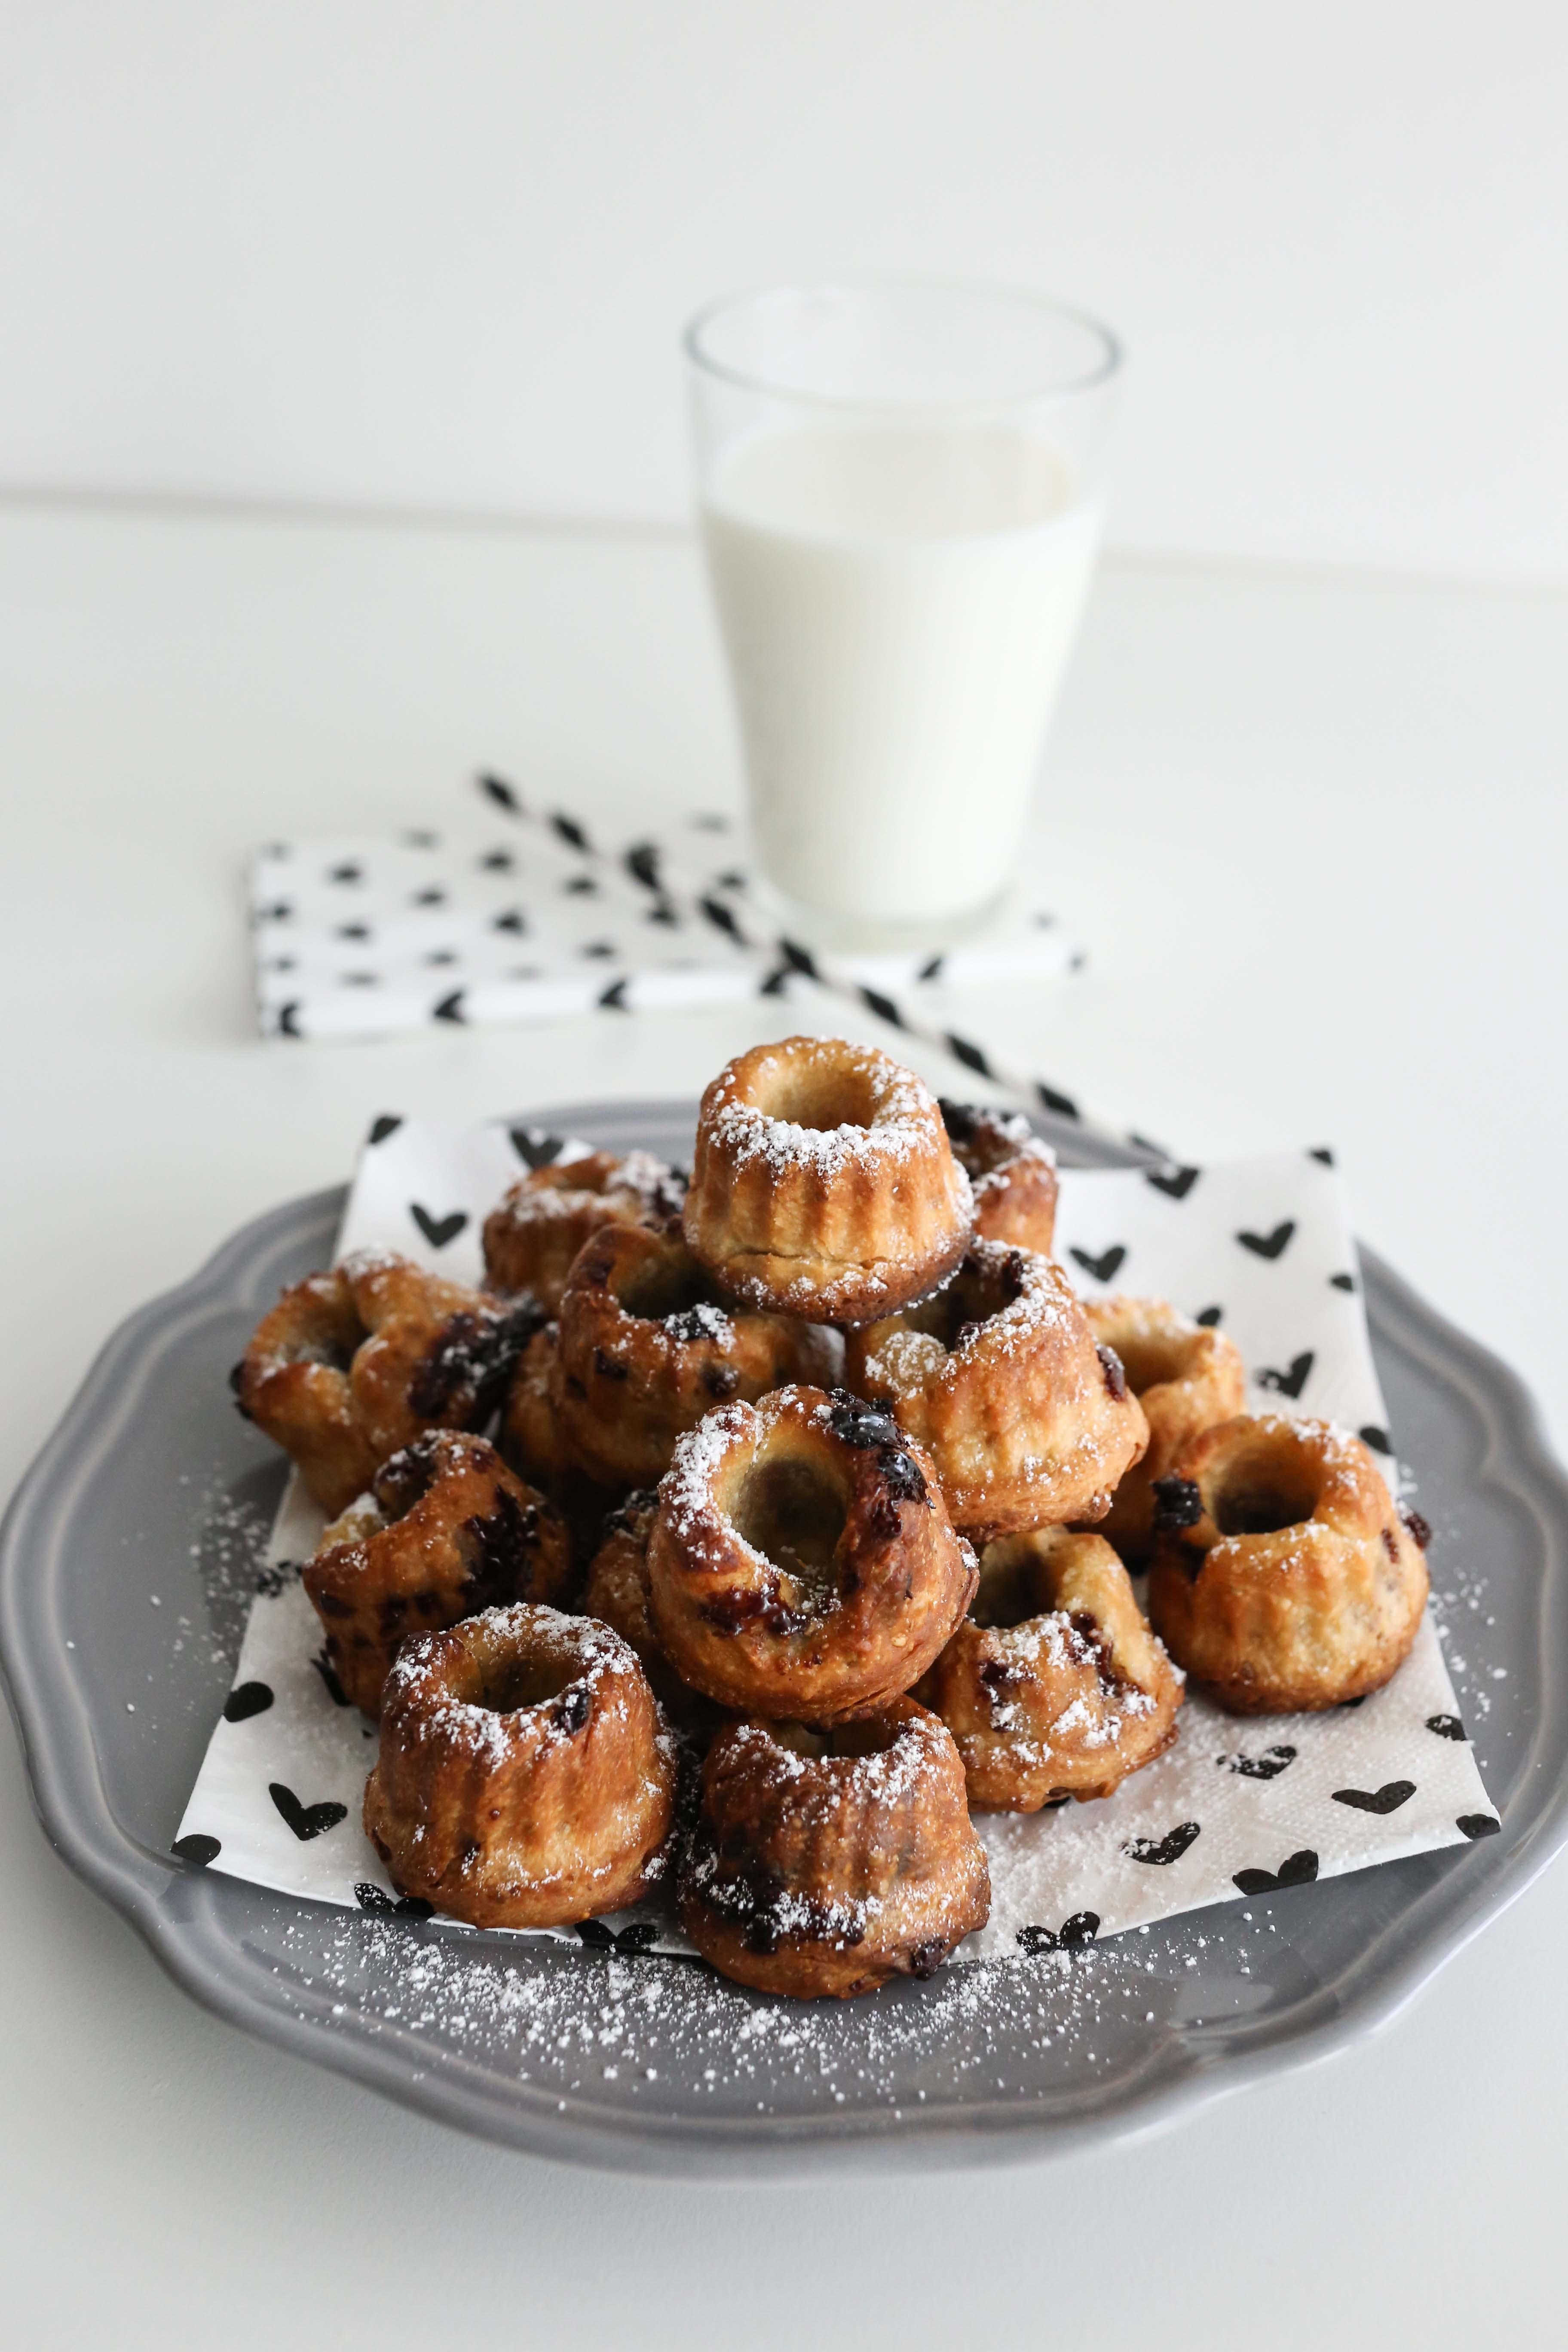 mini-gugel-hupf-schoko-brioche-kleines-dessert-rezept_2535